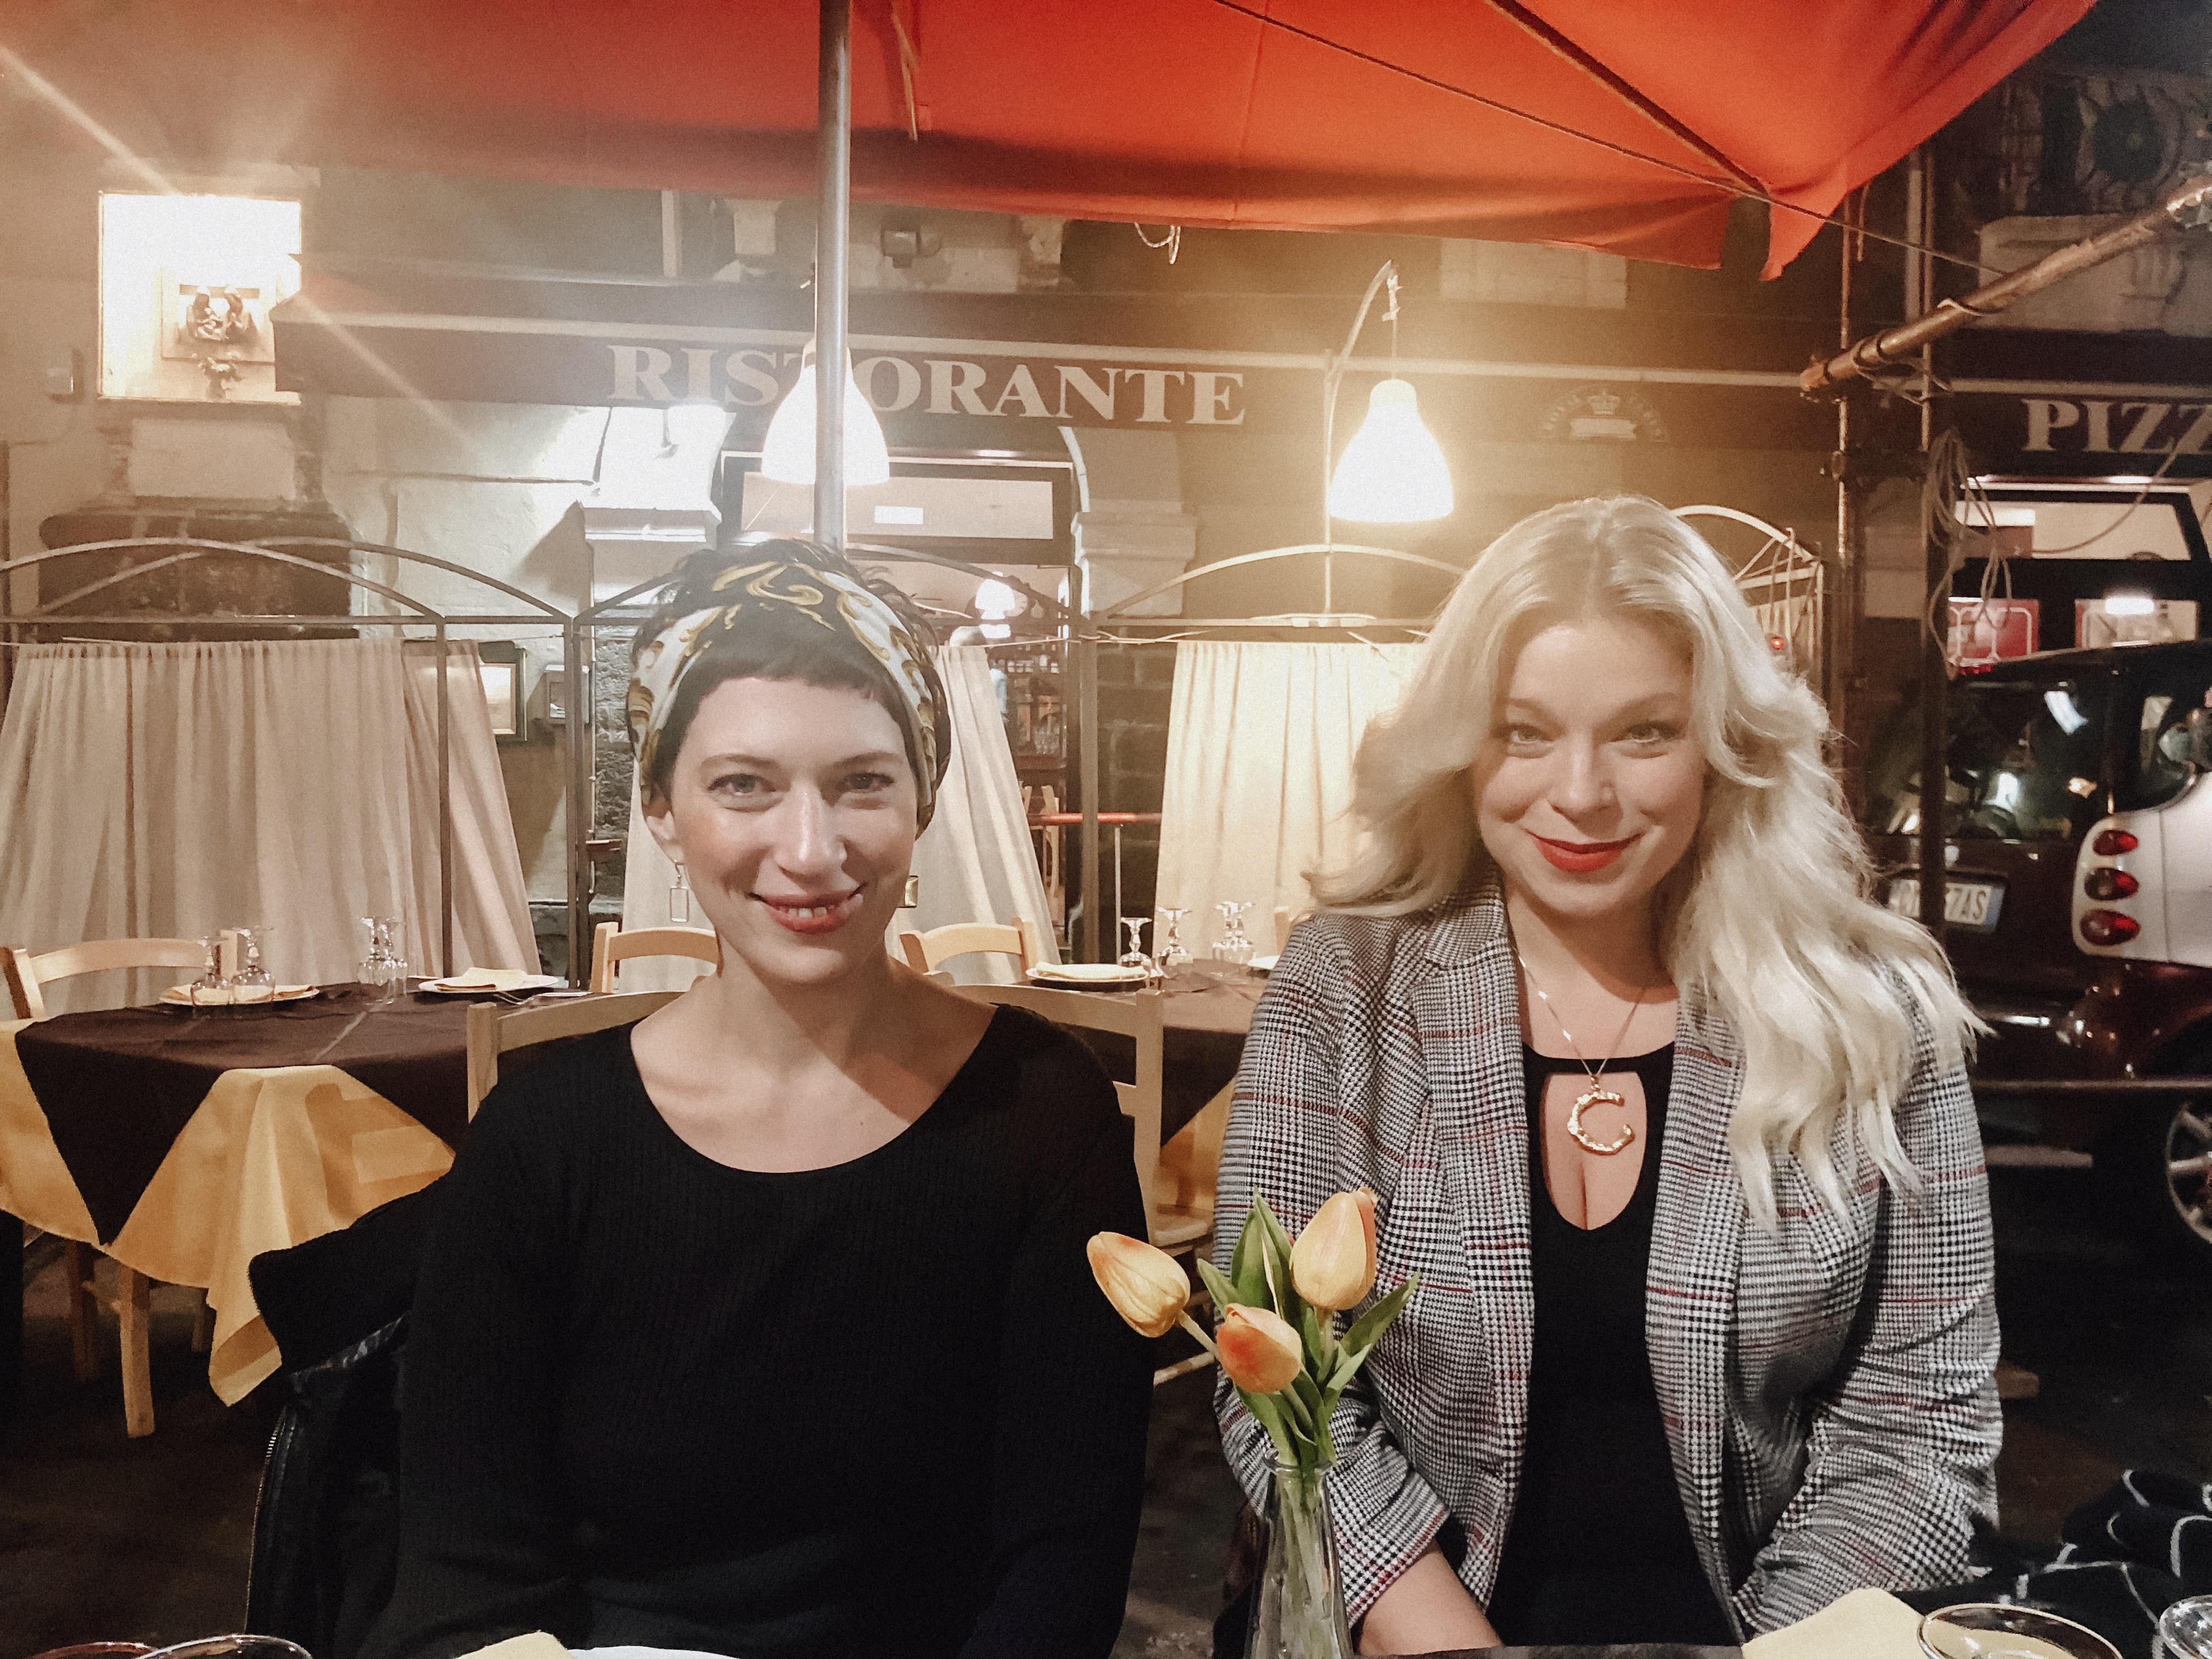 Nachtisch-Tiramisu Zwillideluxe-Megabambi-Caterina-Pogorzelski-Blog-Berlin-essen